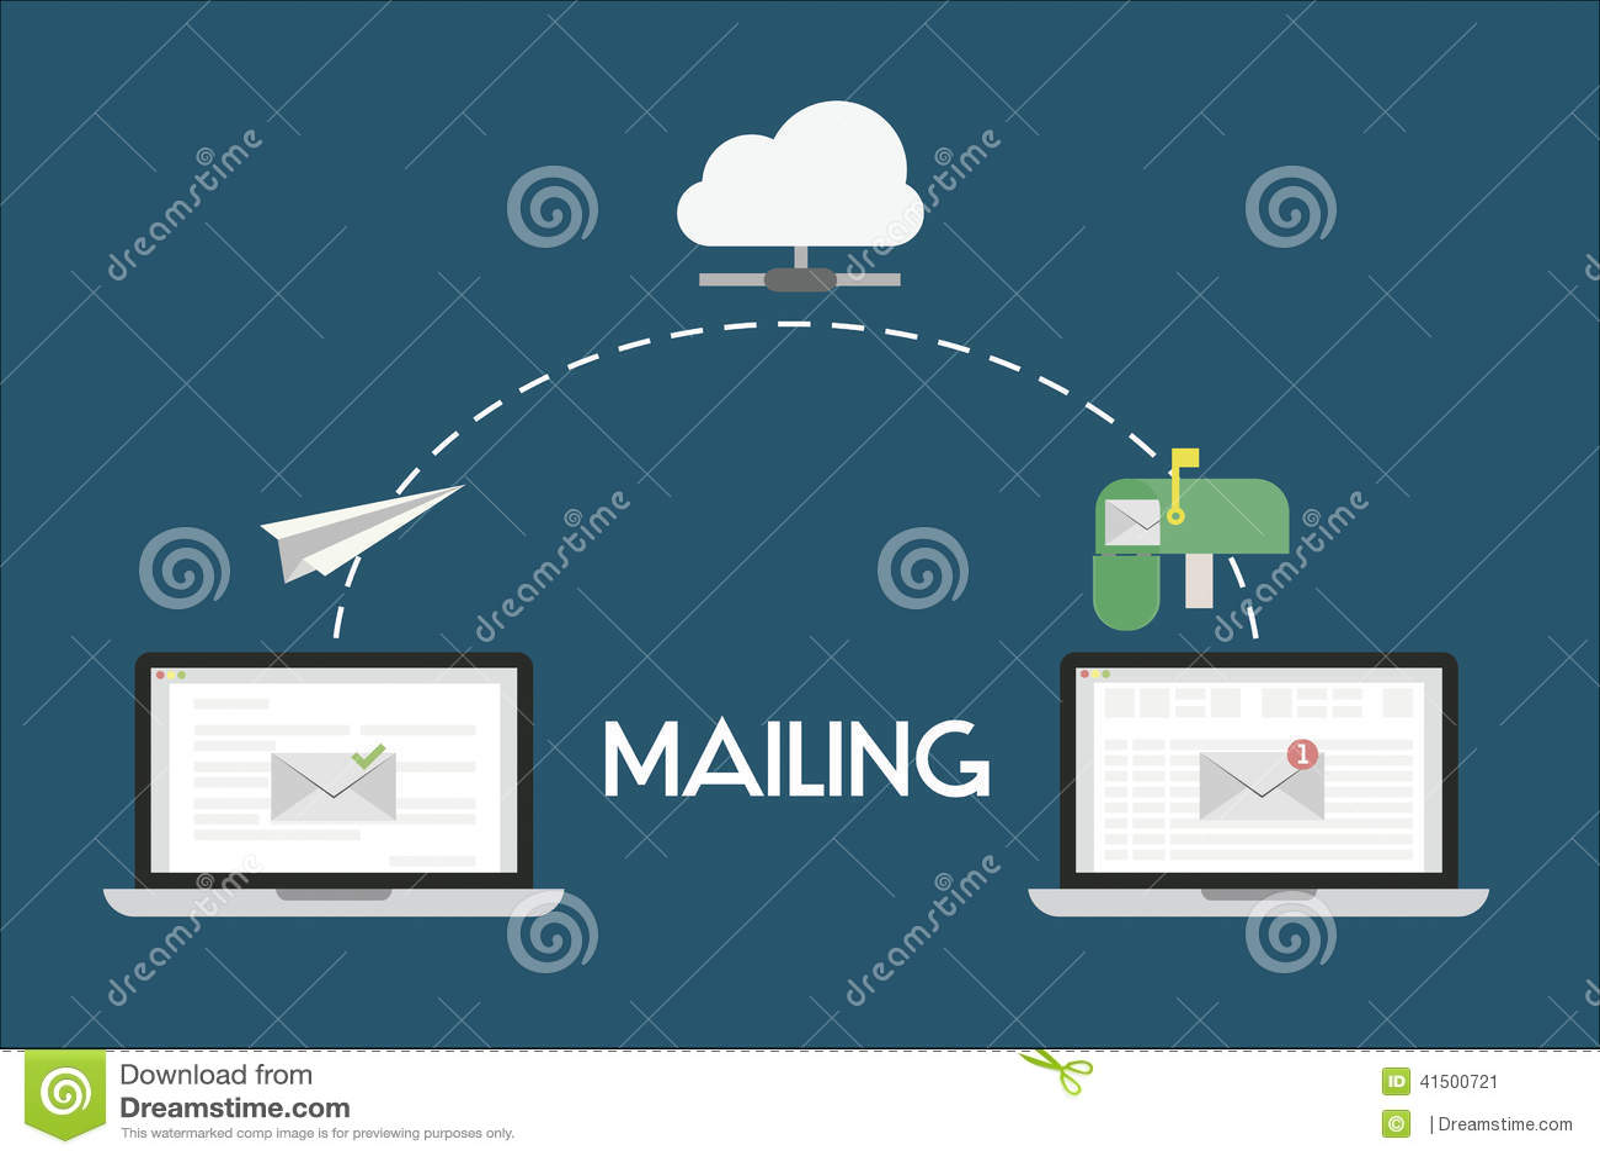 Mailing Flat Illustration